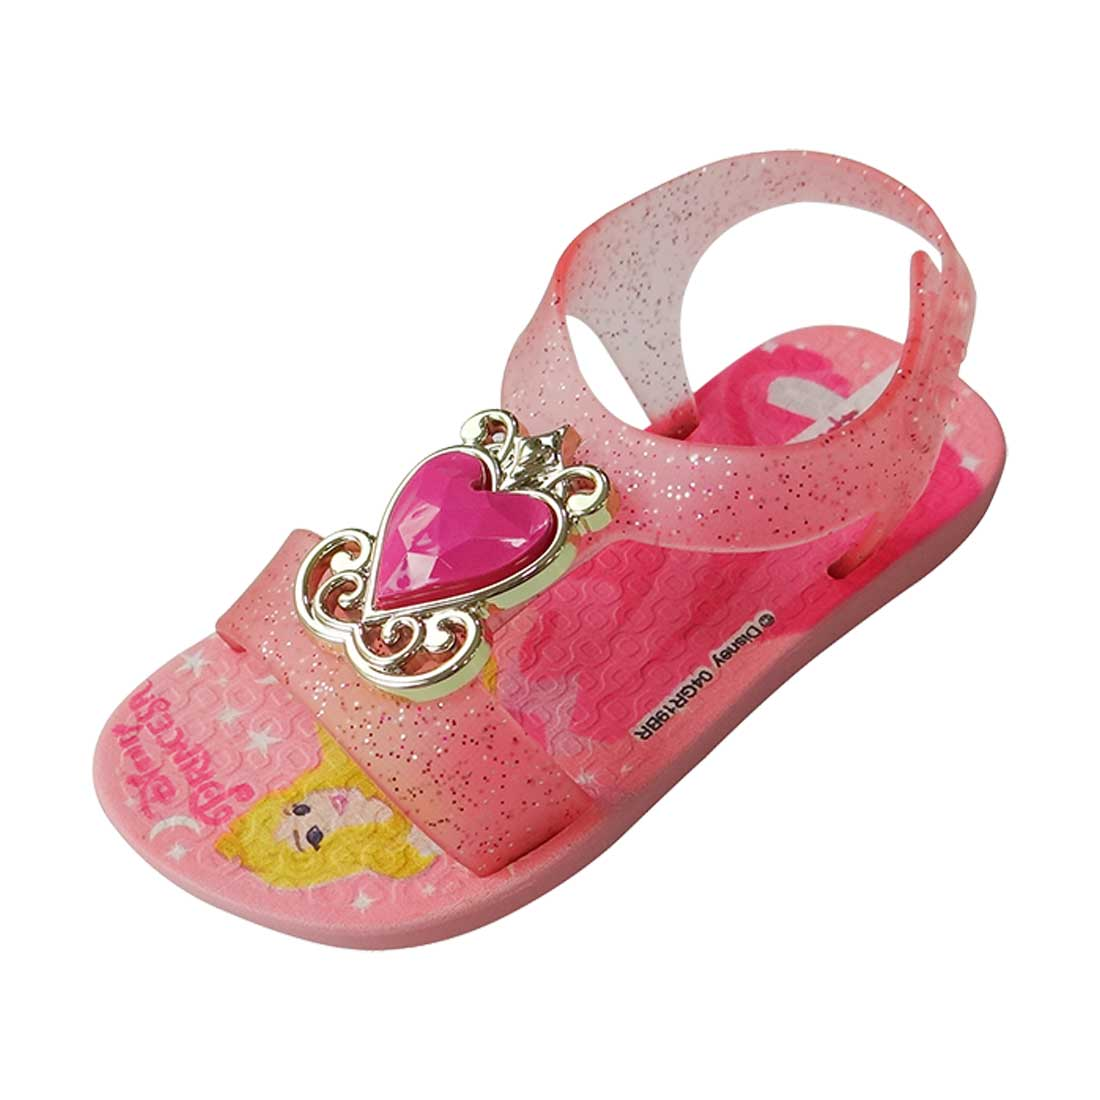 Sandália Baby Disney Princesa - Rosa Bebê